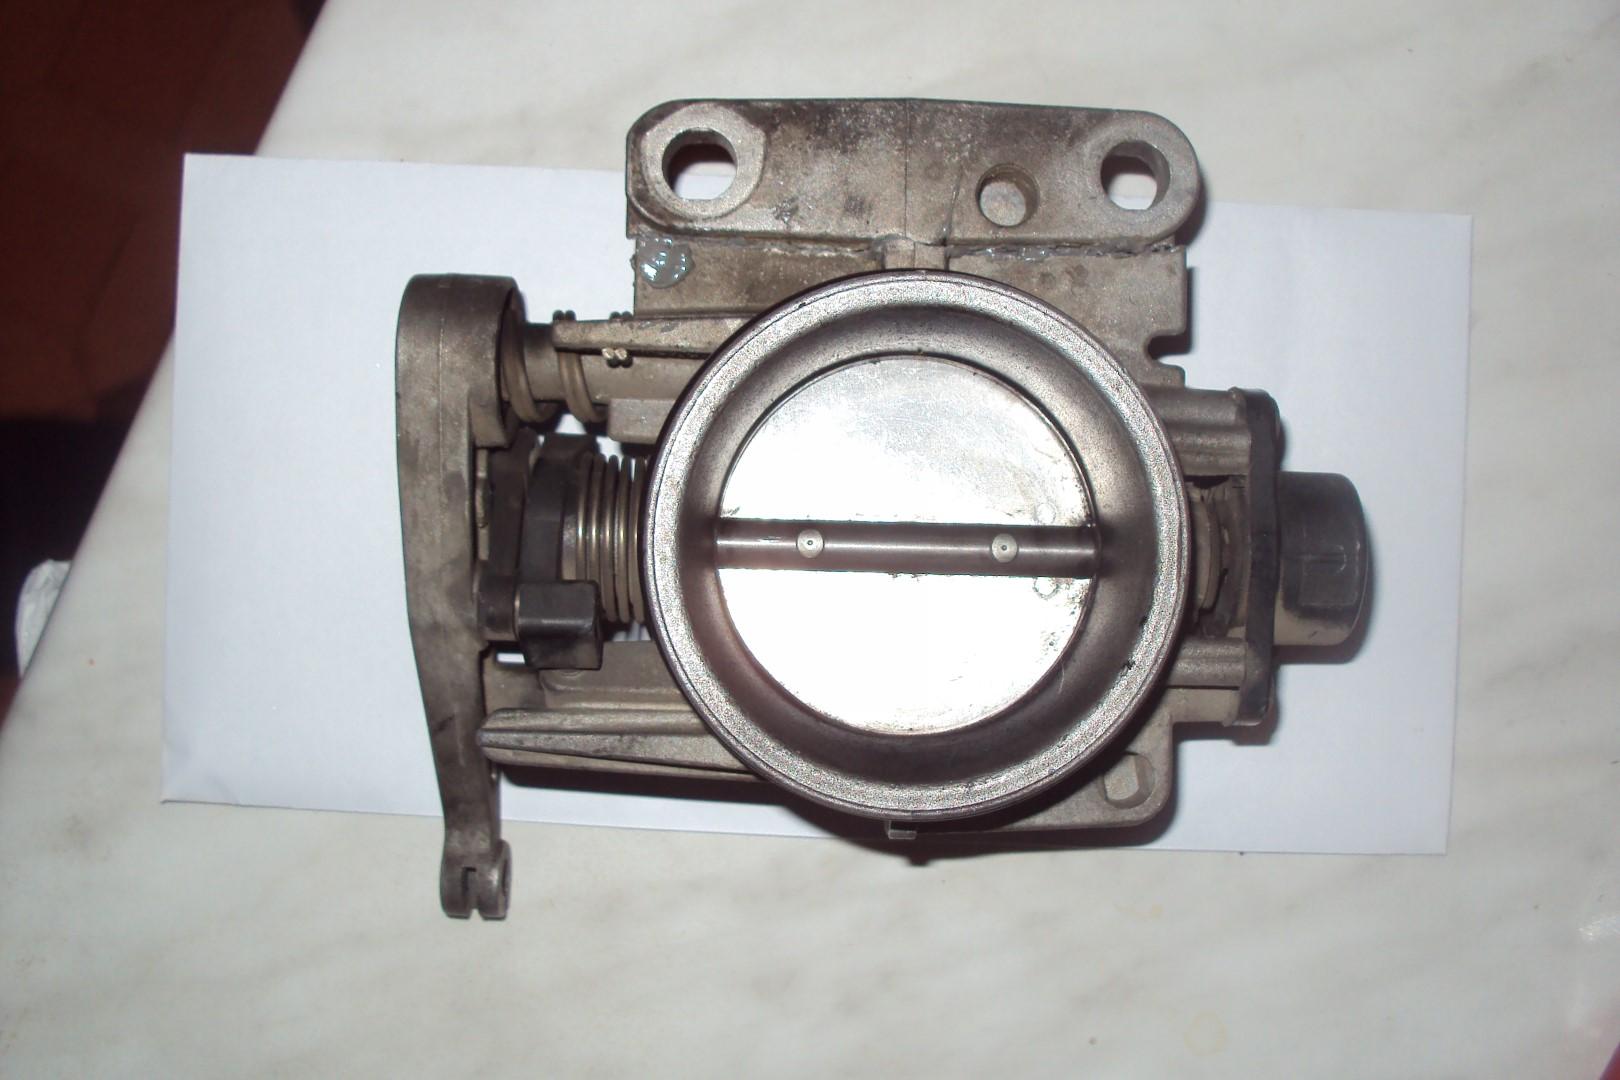 clapeta acceleratie gama renault  16 valve an 1998-2003  meganelaguna ,scenic